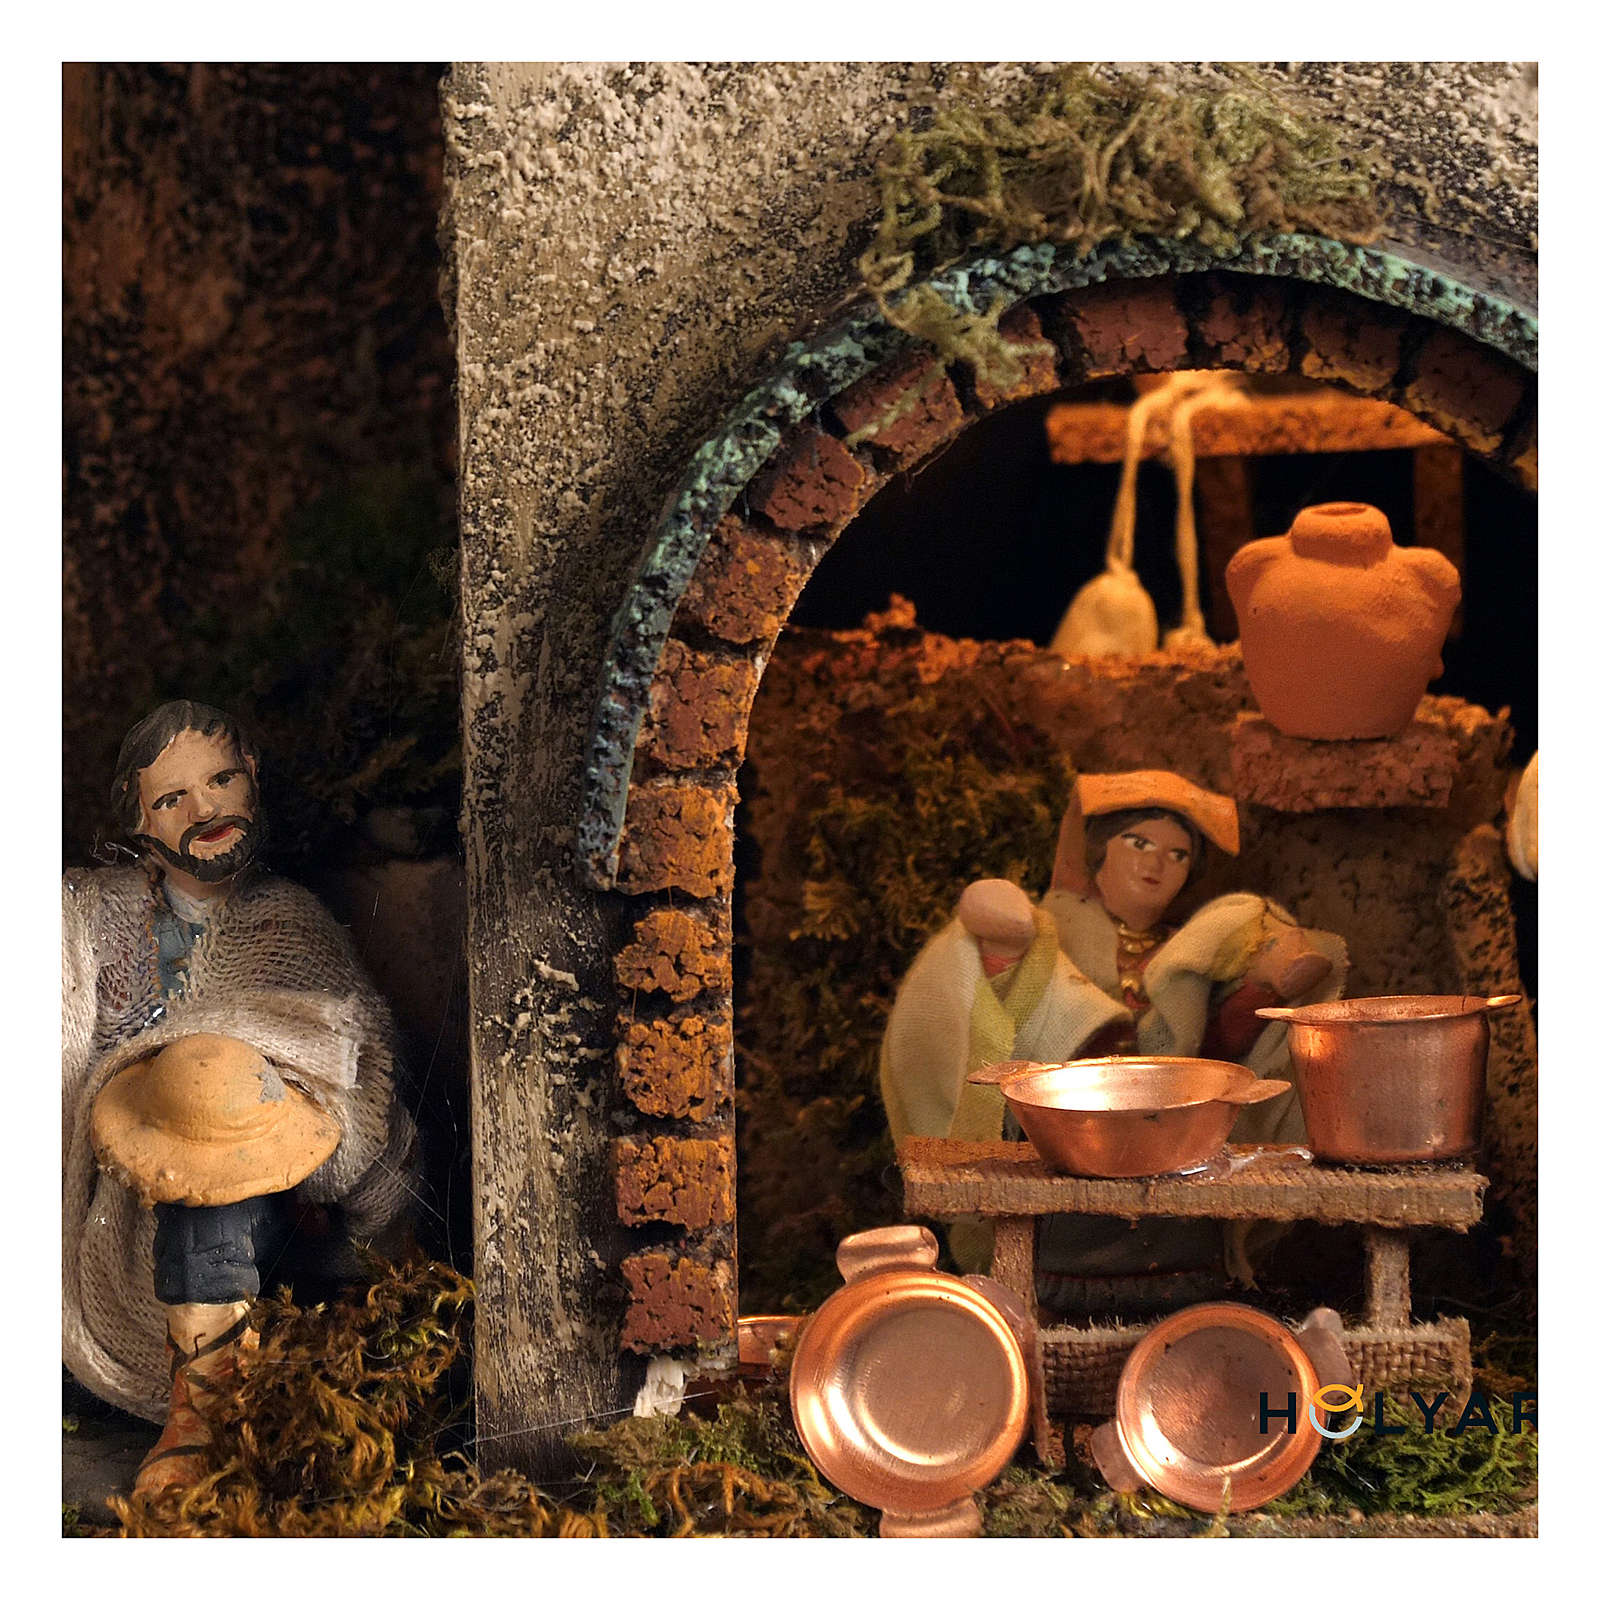 Village setting for Neapolitan Nativity scene 120x100x100 cm, module B, 34 shepherds, 7 movements - 14 cm 4